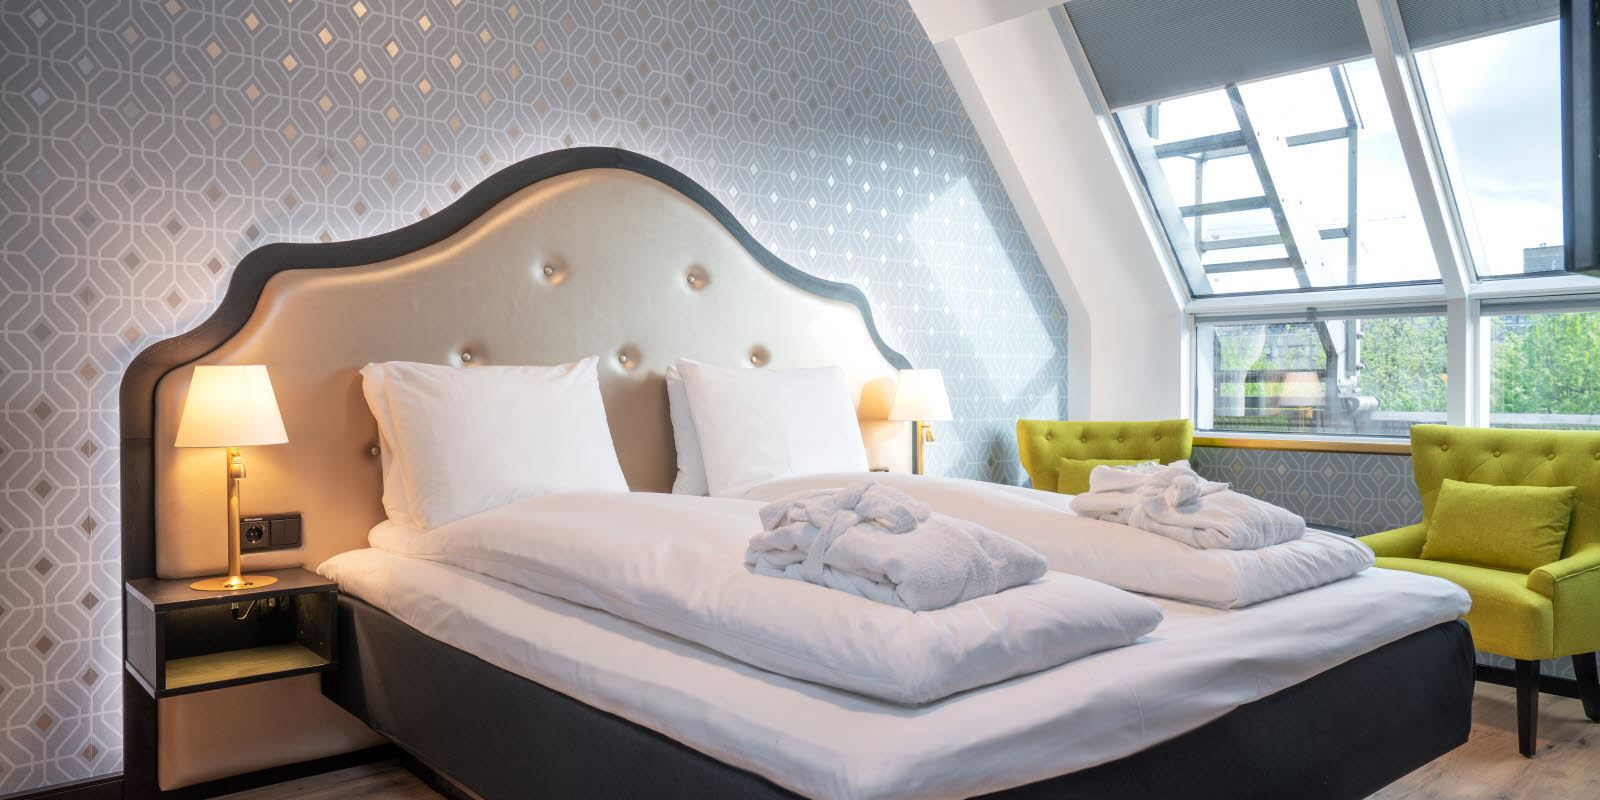 Oppredd seng i Juniorsuite på Thon Hotel Cecil